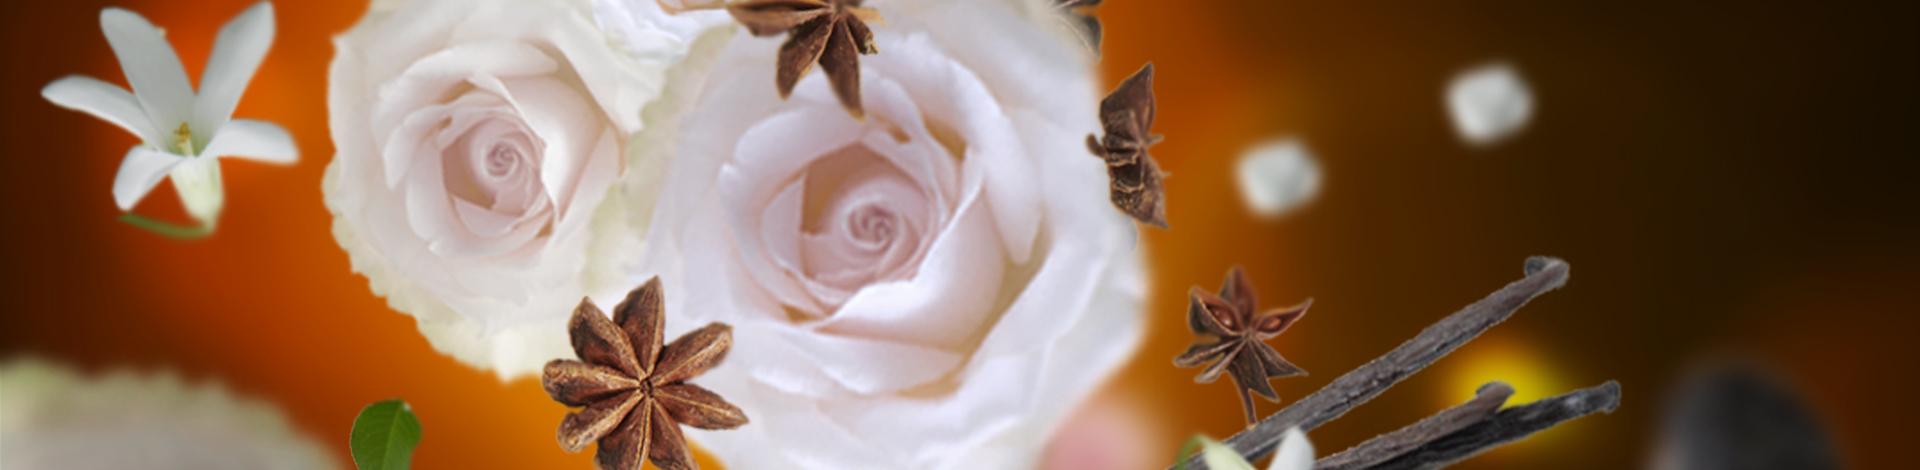 maison-berger-paris-aroma-relax-oriental-comfort